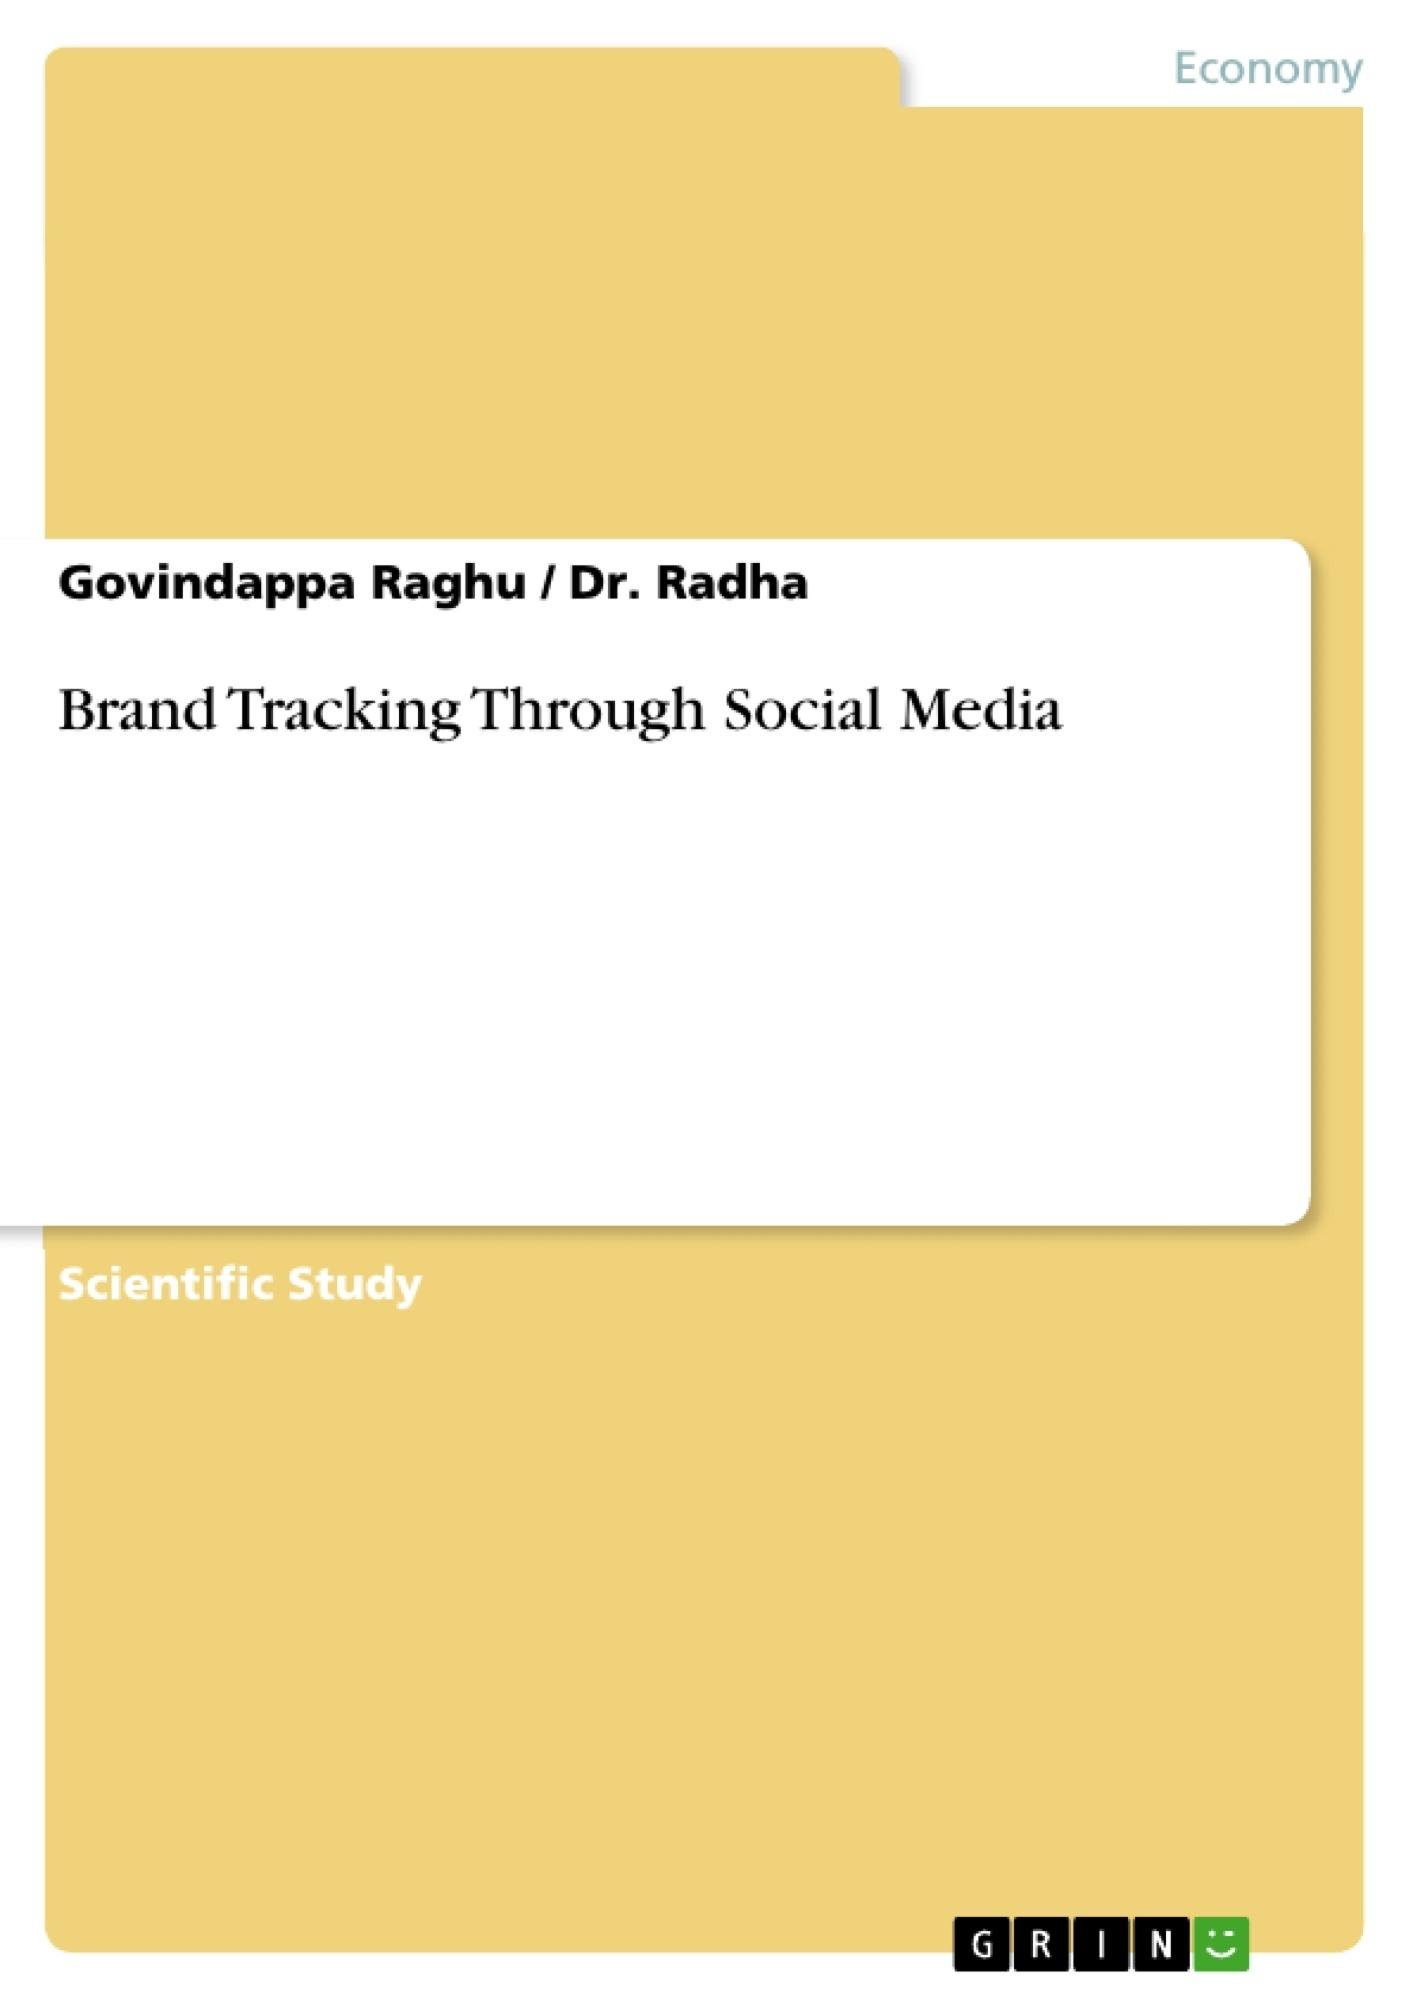 Title: Brand Tracking Through Social Media